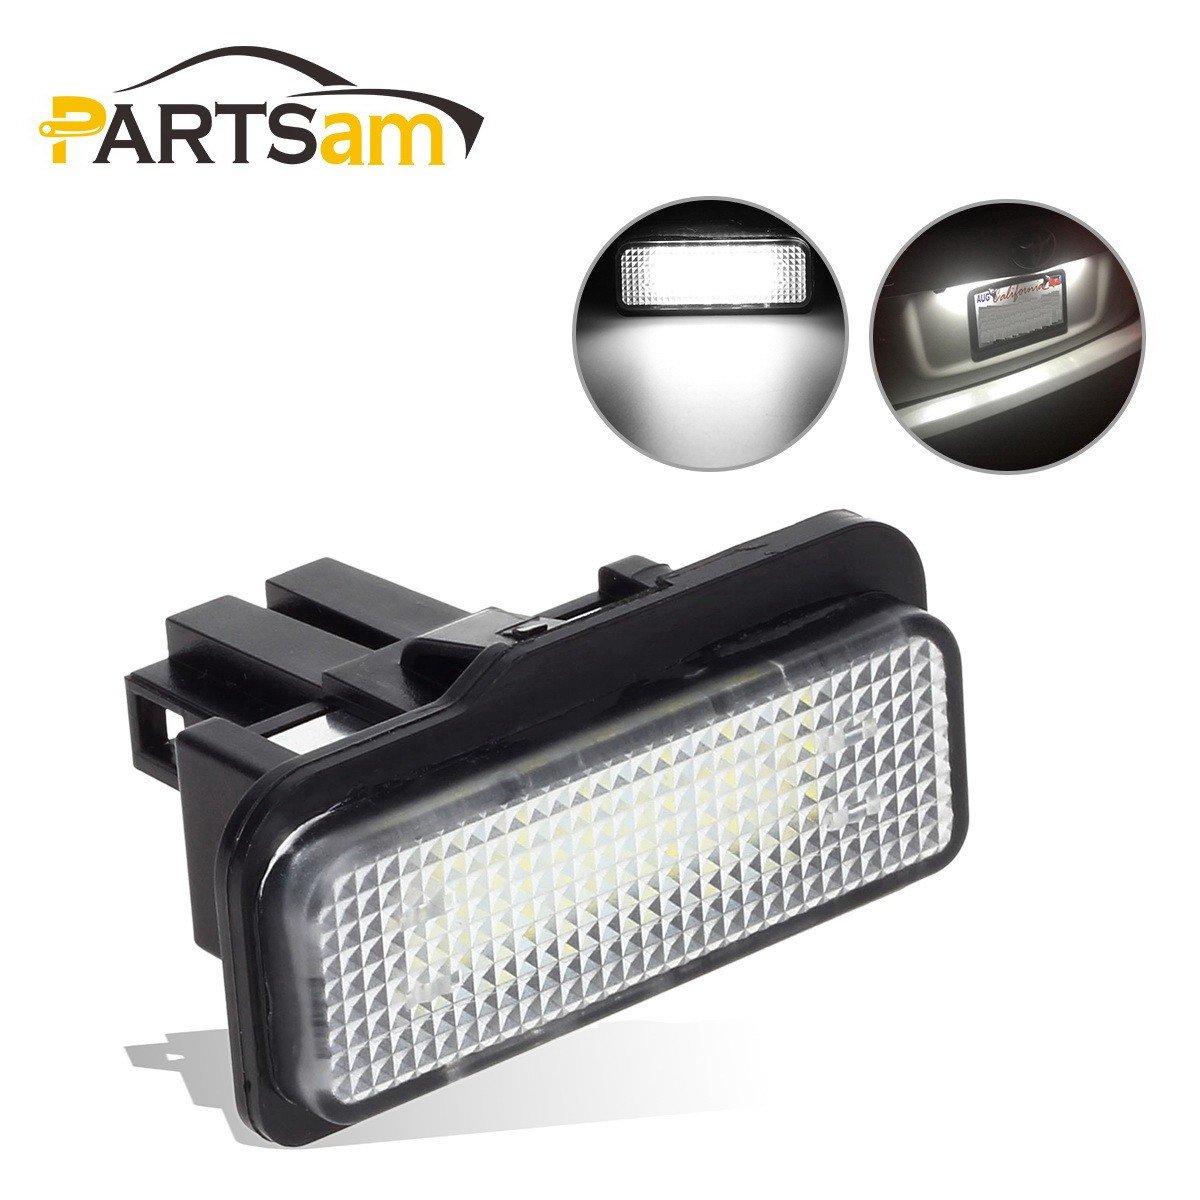 Partsam 2pcs White 6000K 18-SMD 12V LED License Plate Lights Lamp Set Assemblies for Mercedes-Benz C-Class W203/E-Class W211/S211/CLS-Class W219/SLK-Class R171